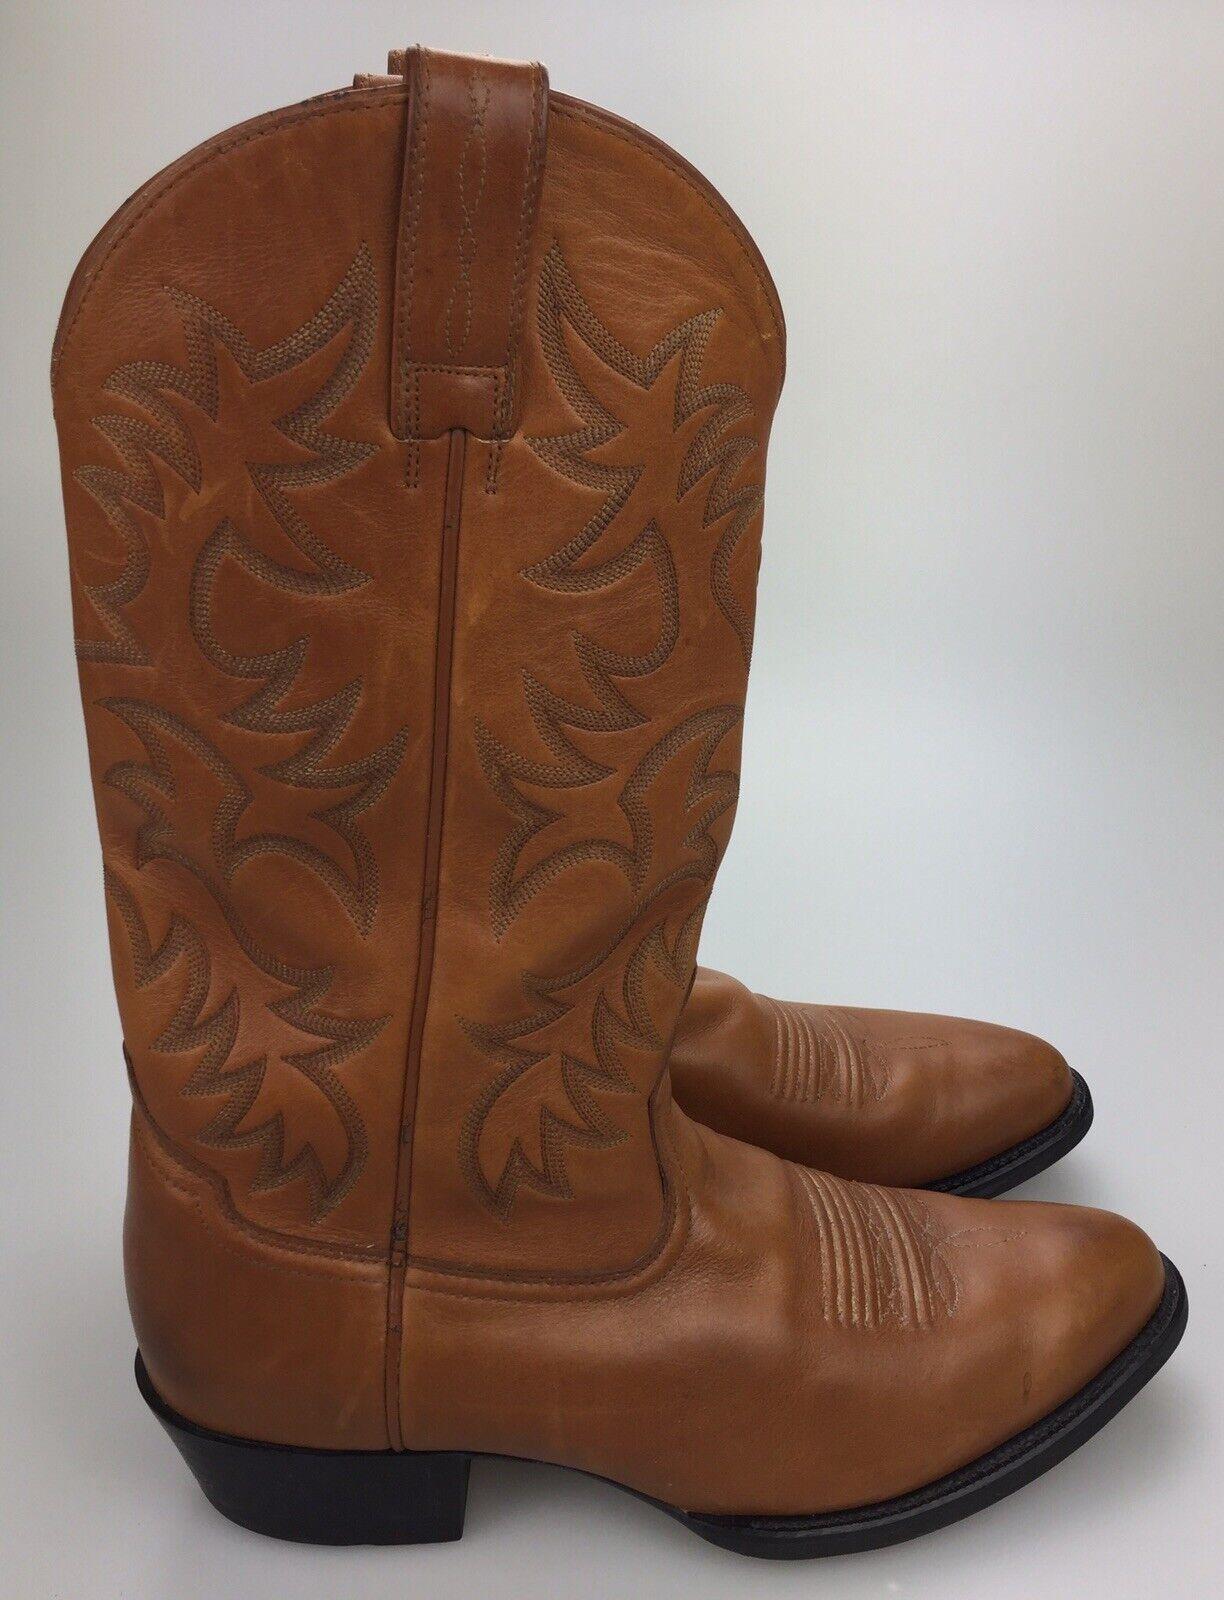 Ariat 34721 Heritage STOCKhomme HOMME TAILLE 11 D Western en cuir beige bottes cowboy